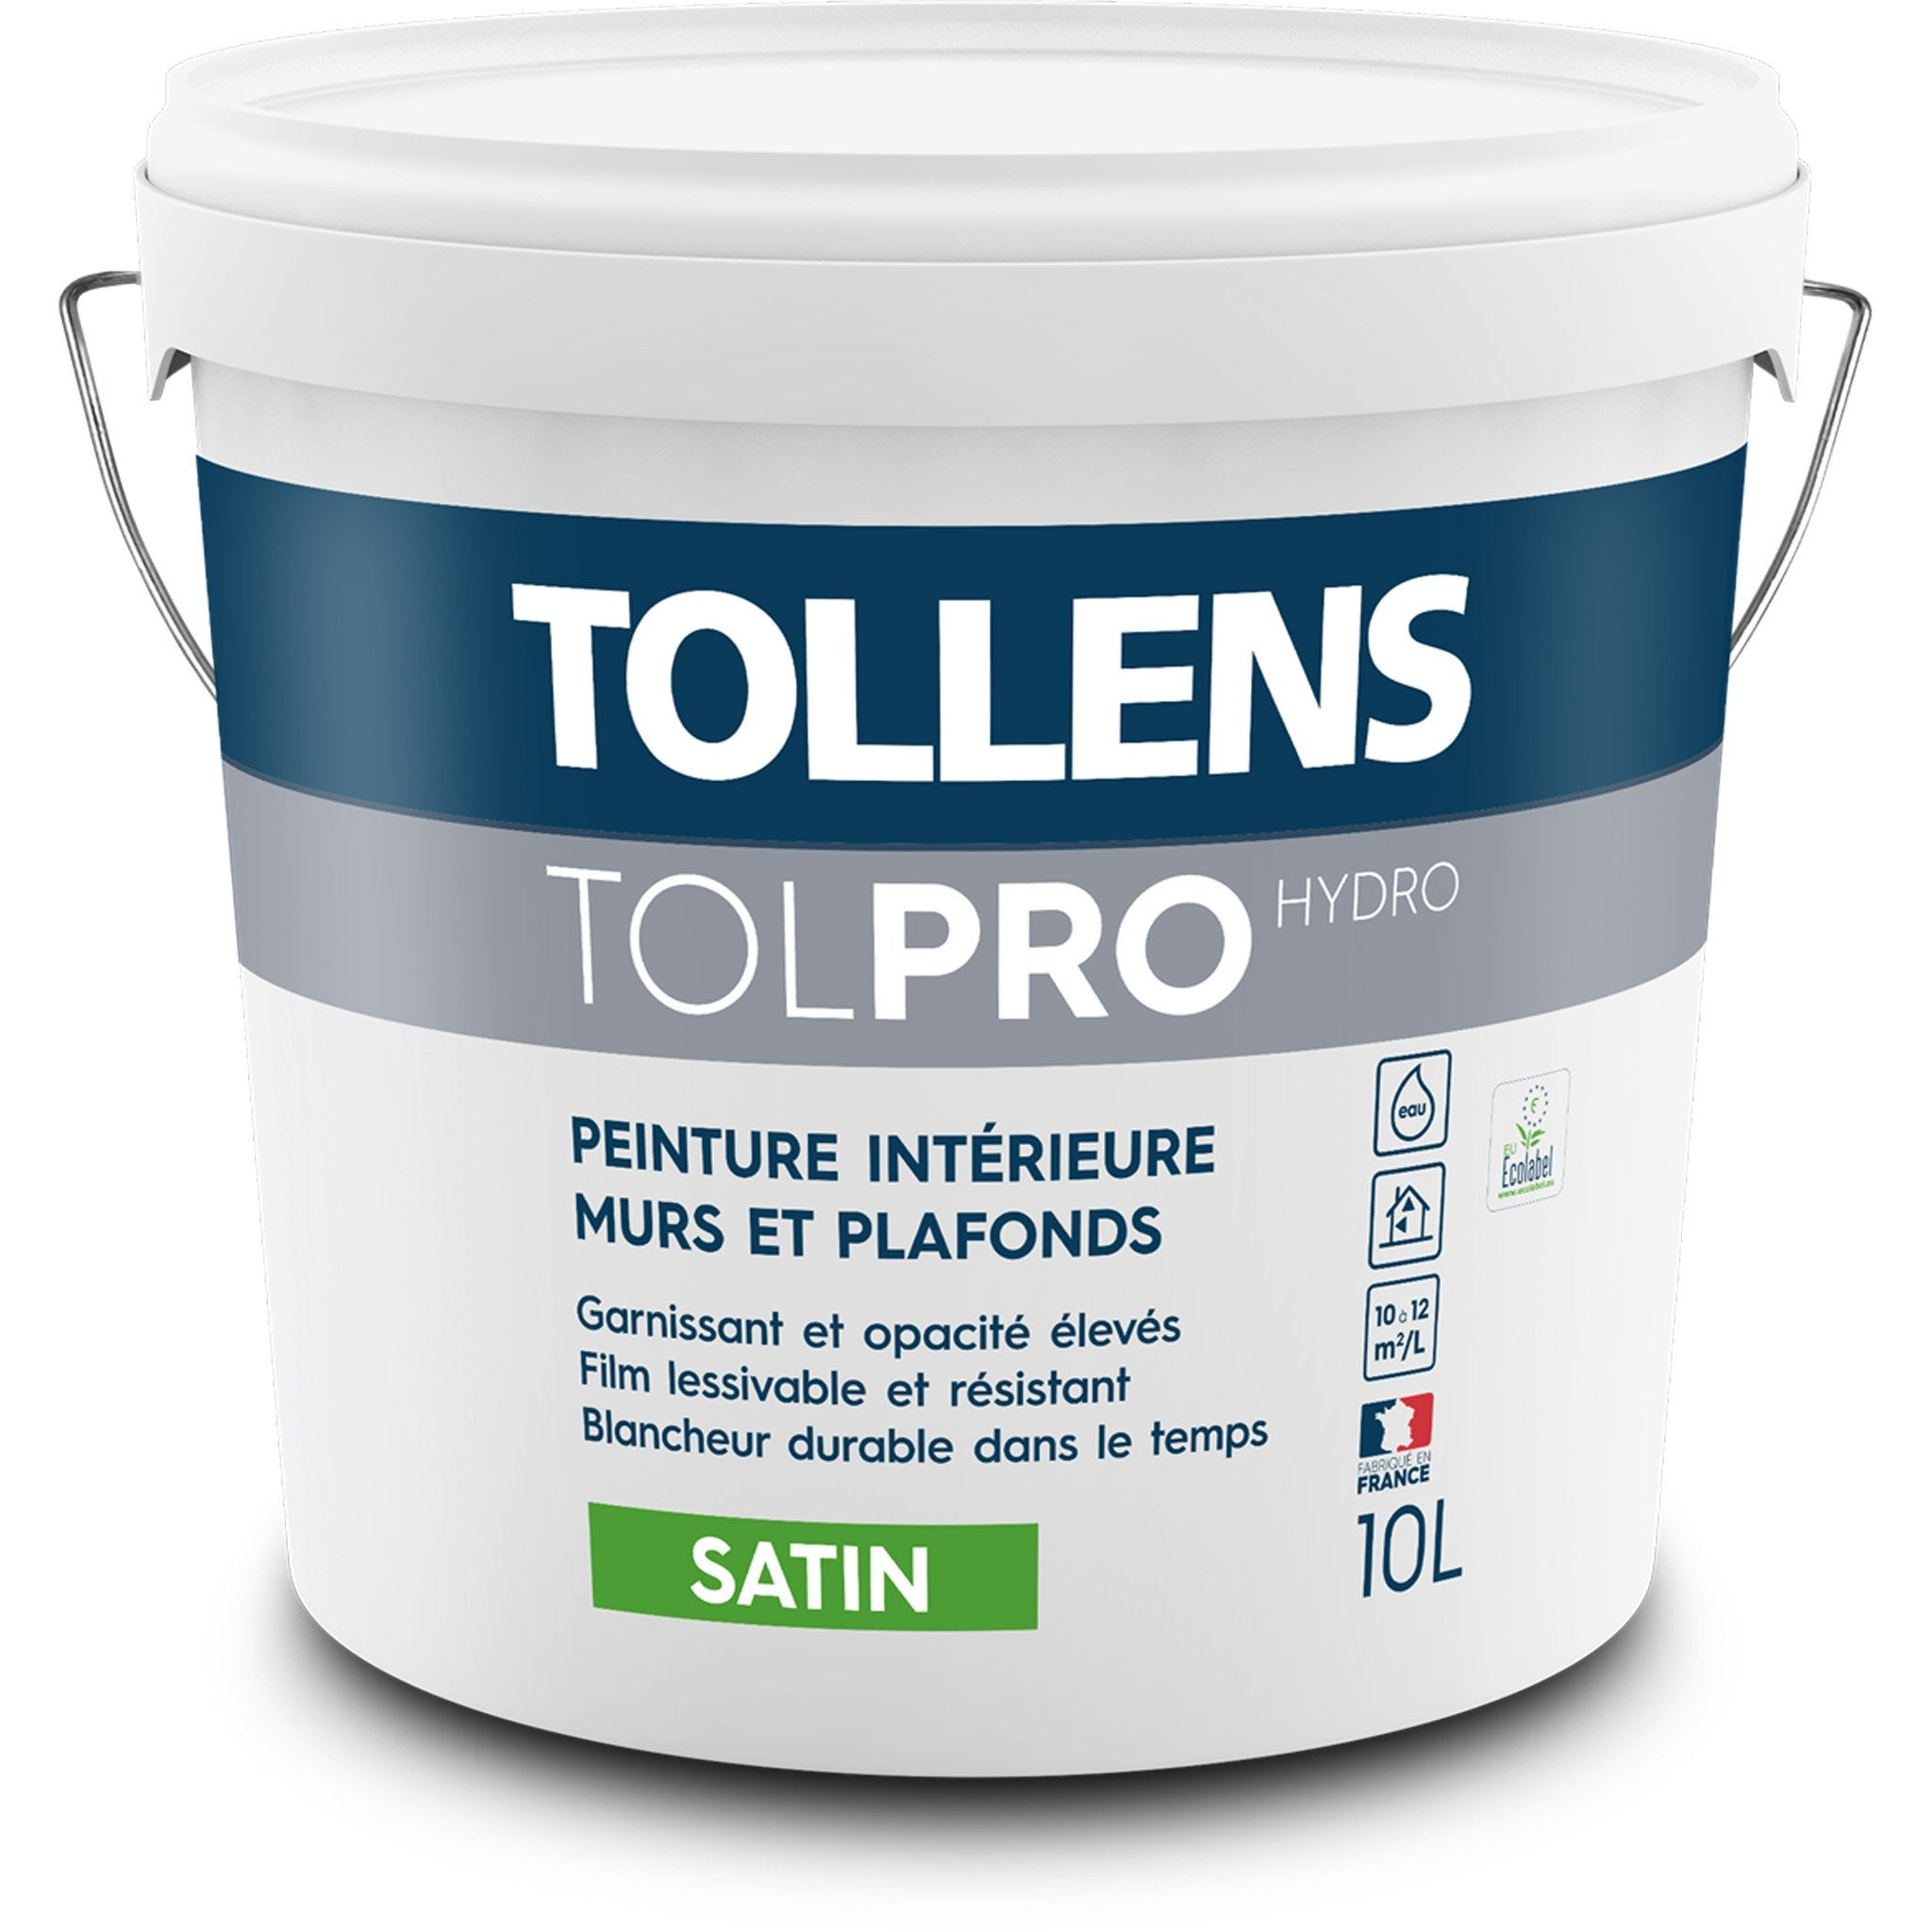 Peinture Tollens Mur Et Plafond Tolpro Hydro Blanc Satin 10 L